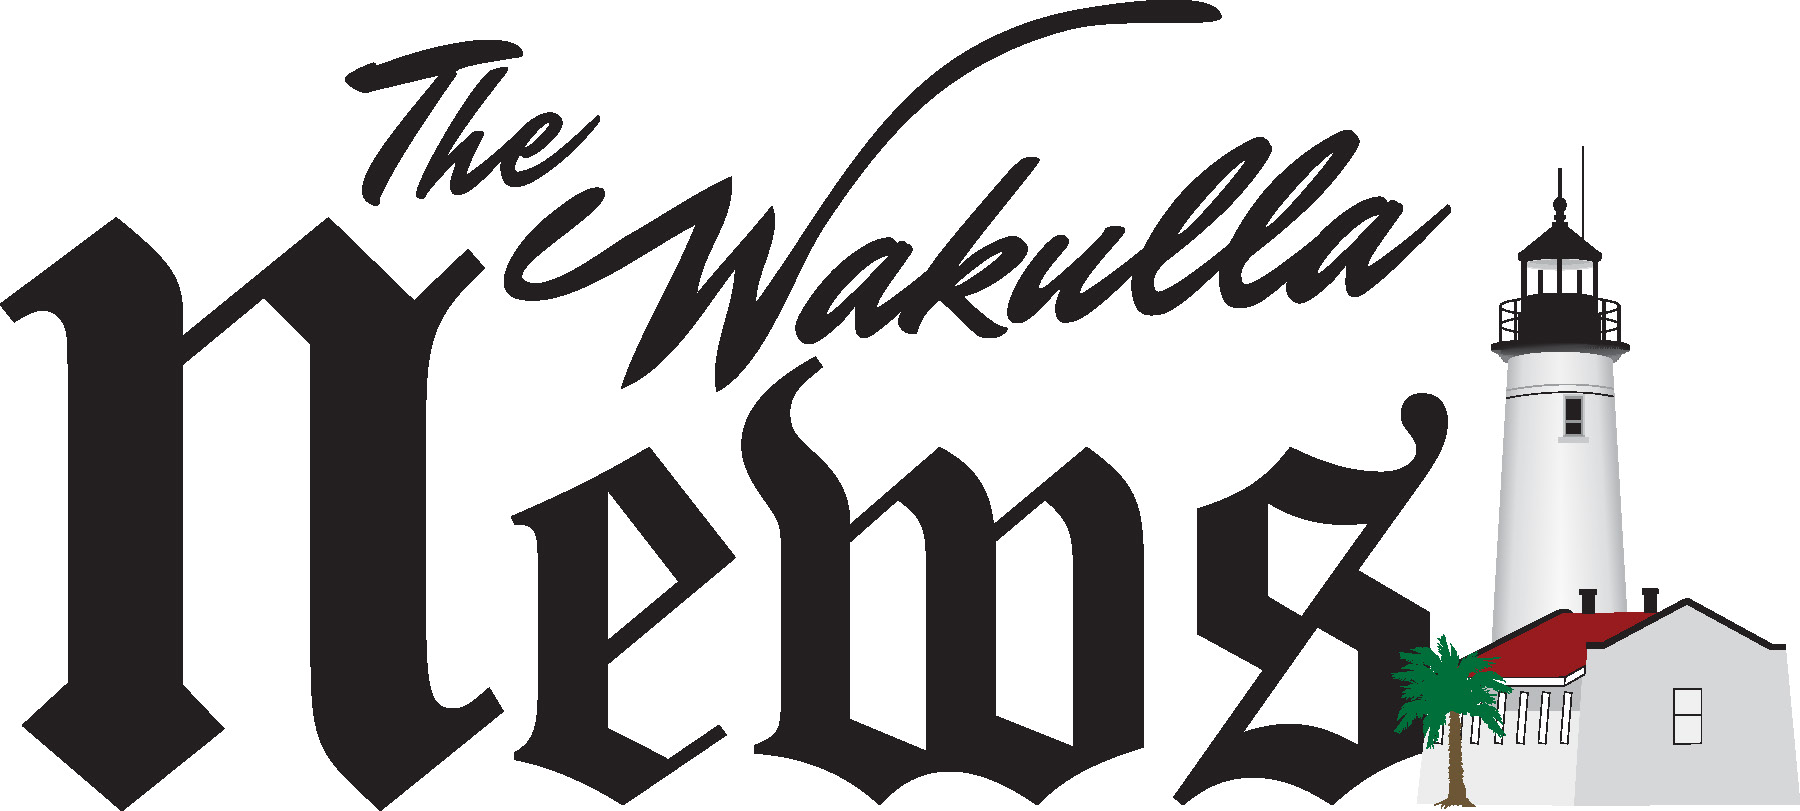 Sopchoppy Worm Gruntin' Festival 5K Sponsor - The Wakulla News